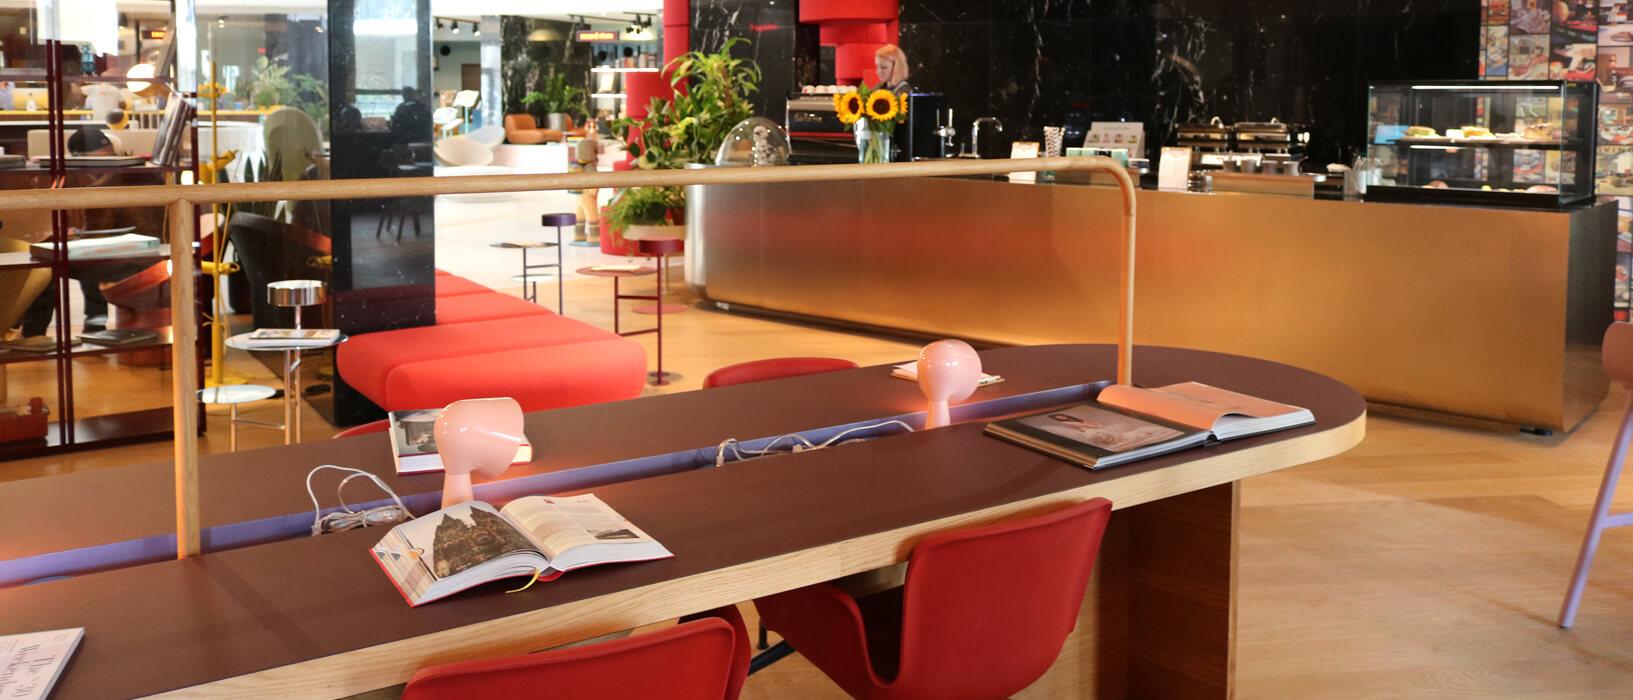 Coworking-Cafés - Schöner Arbeiten | Neni Deli